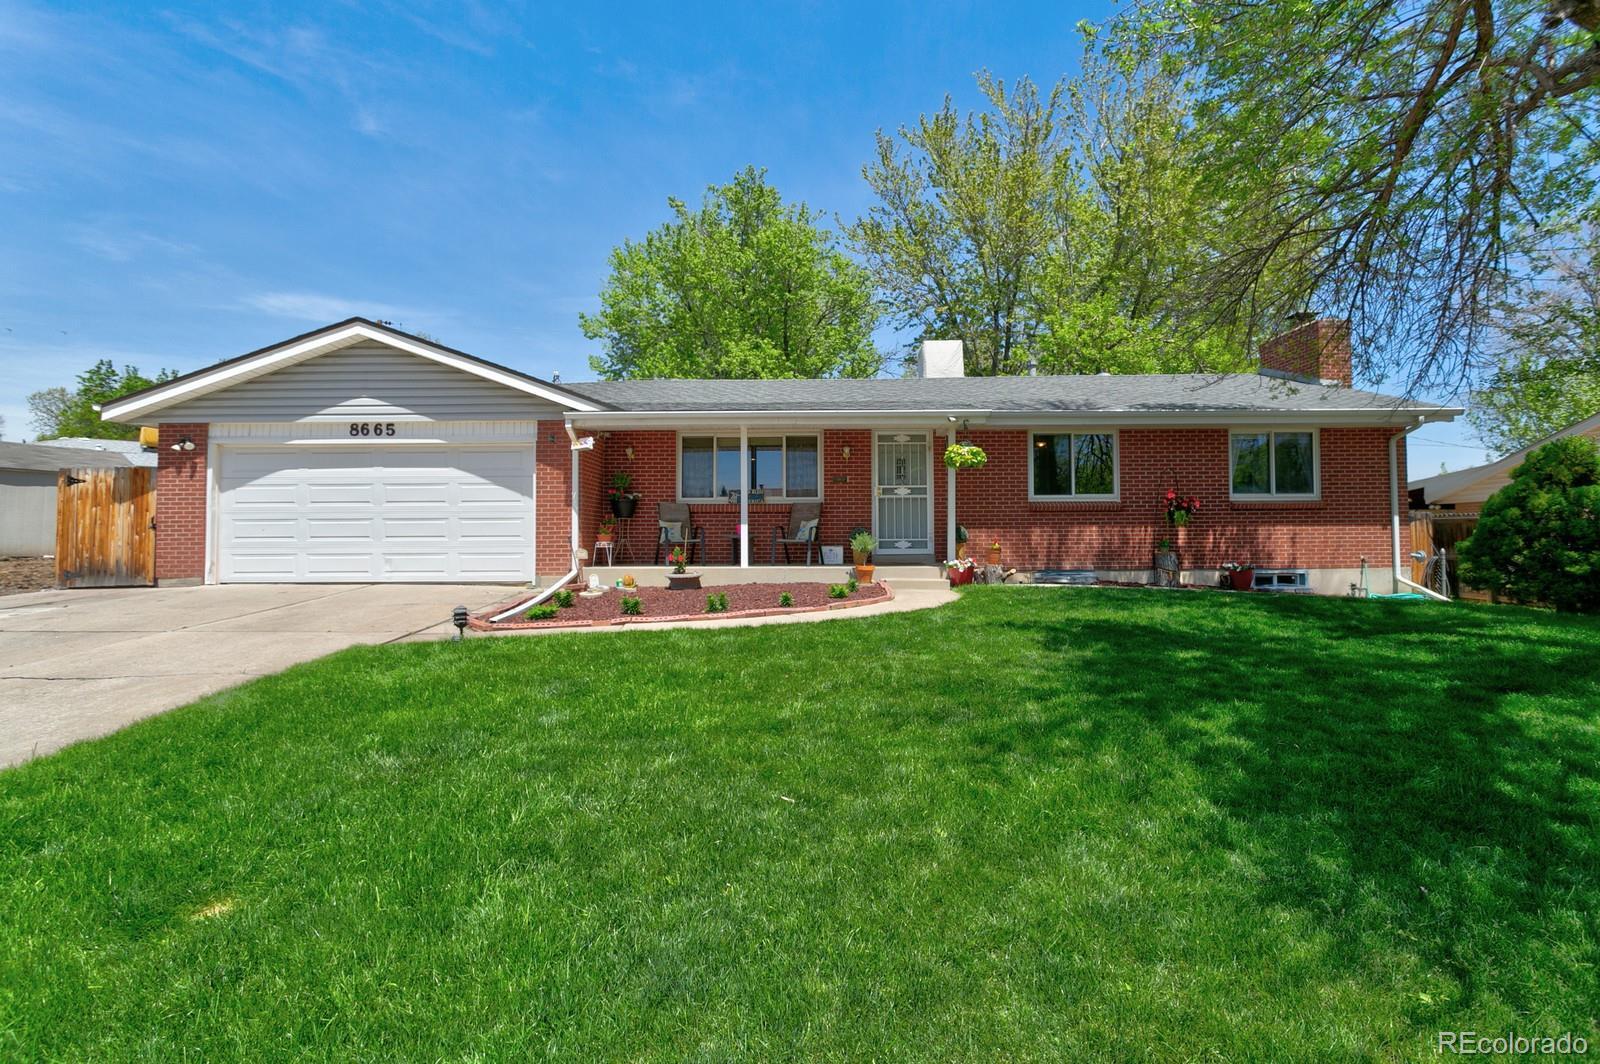 8665 W Utah Avenue, Lakewood, CO 80232 - Lakewood, CO real estate listing